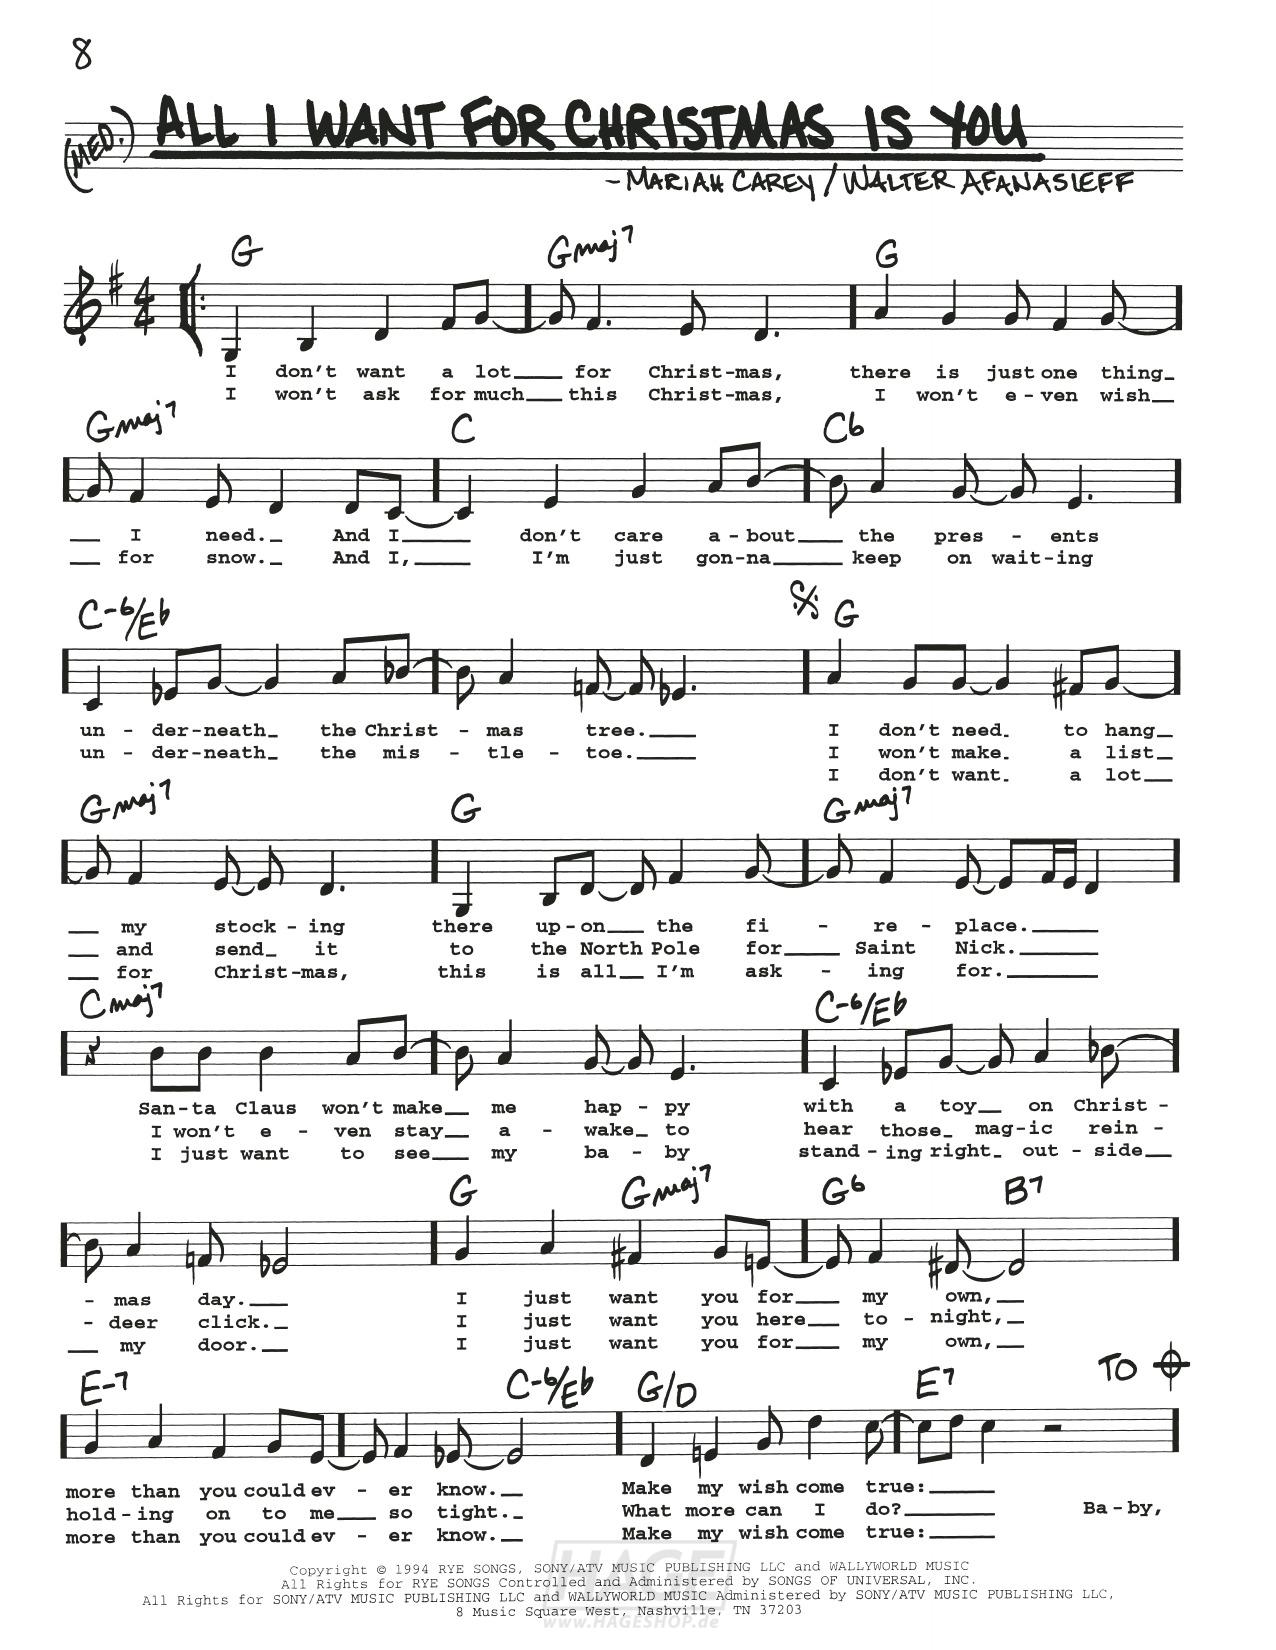 All I Want For Christmas Is You - Mariah Carey - Noten Druckvorschau